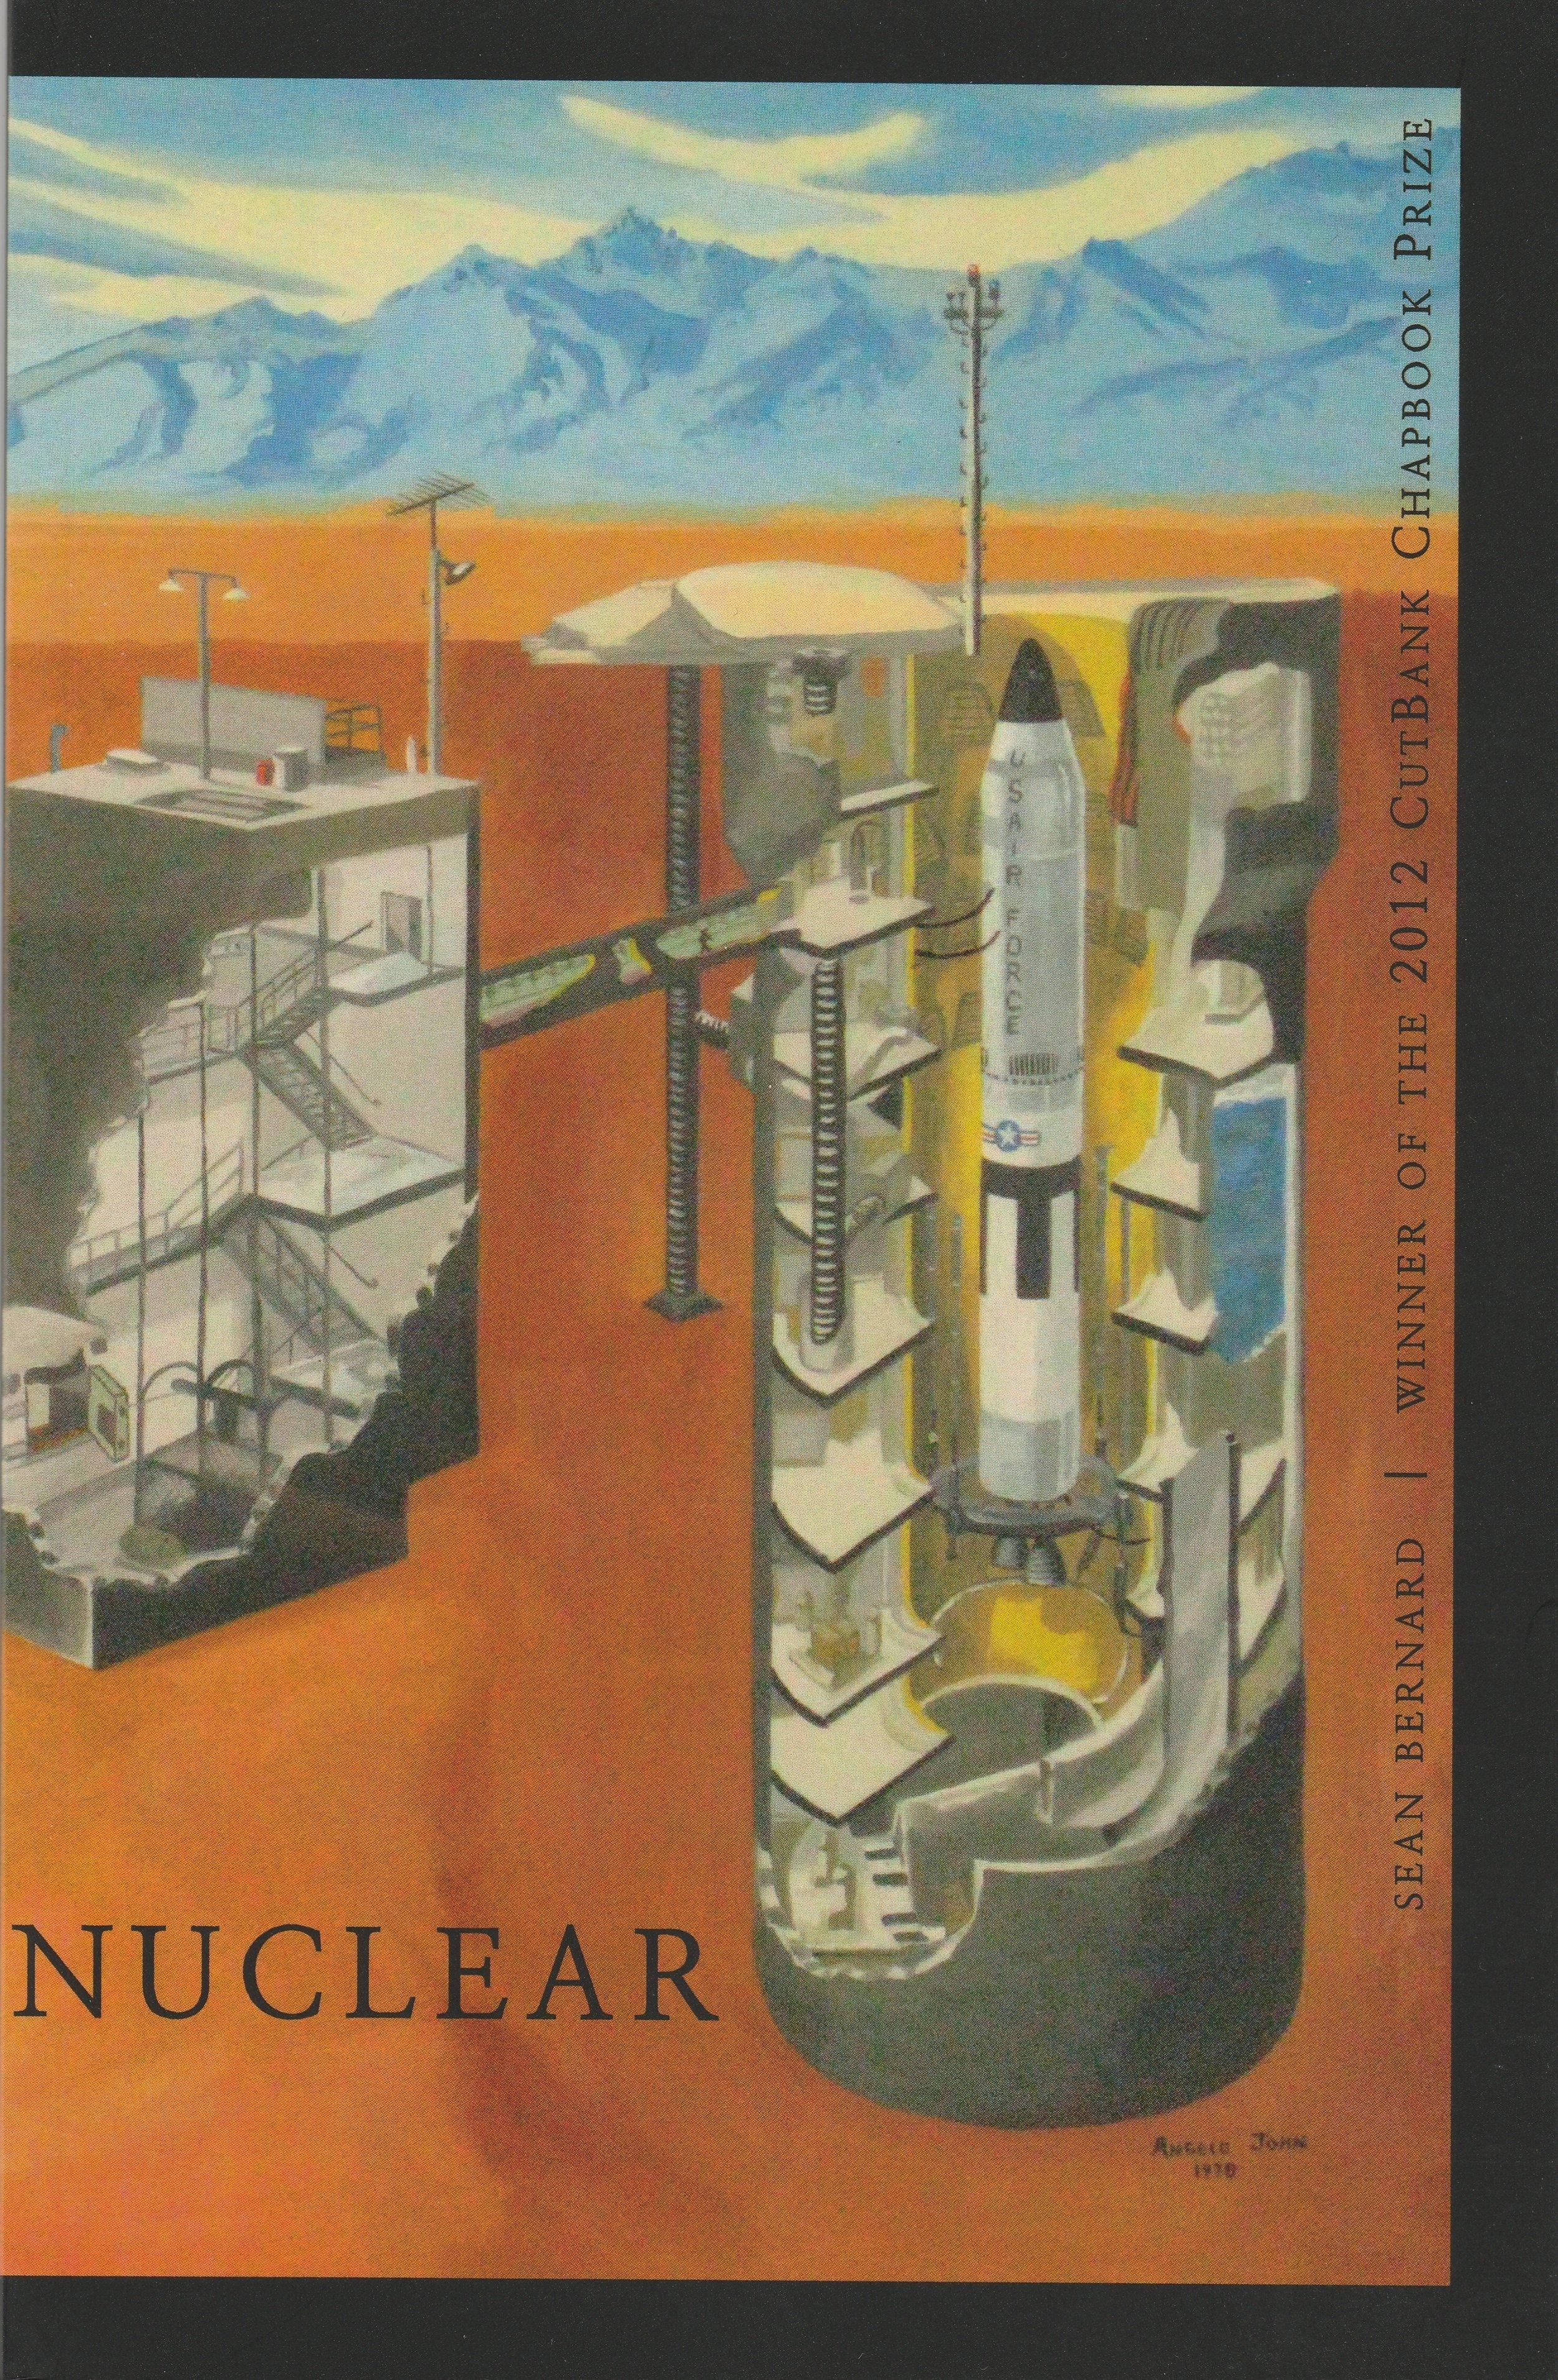 nuclear cover_0001.jpg